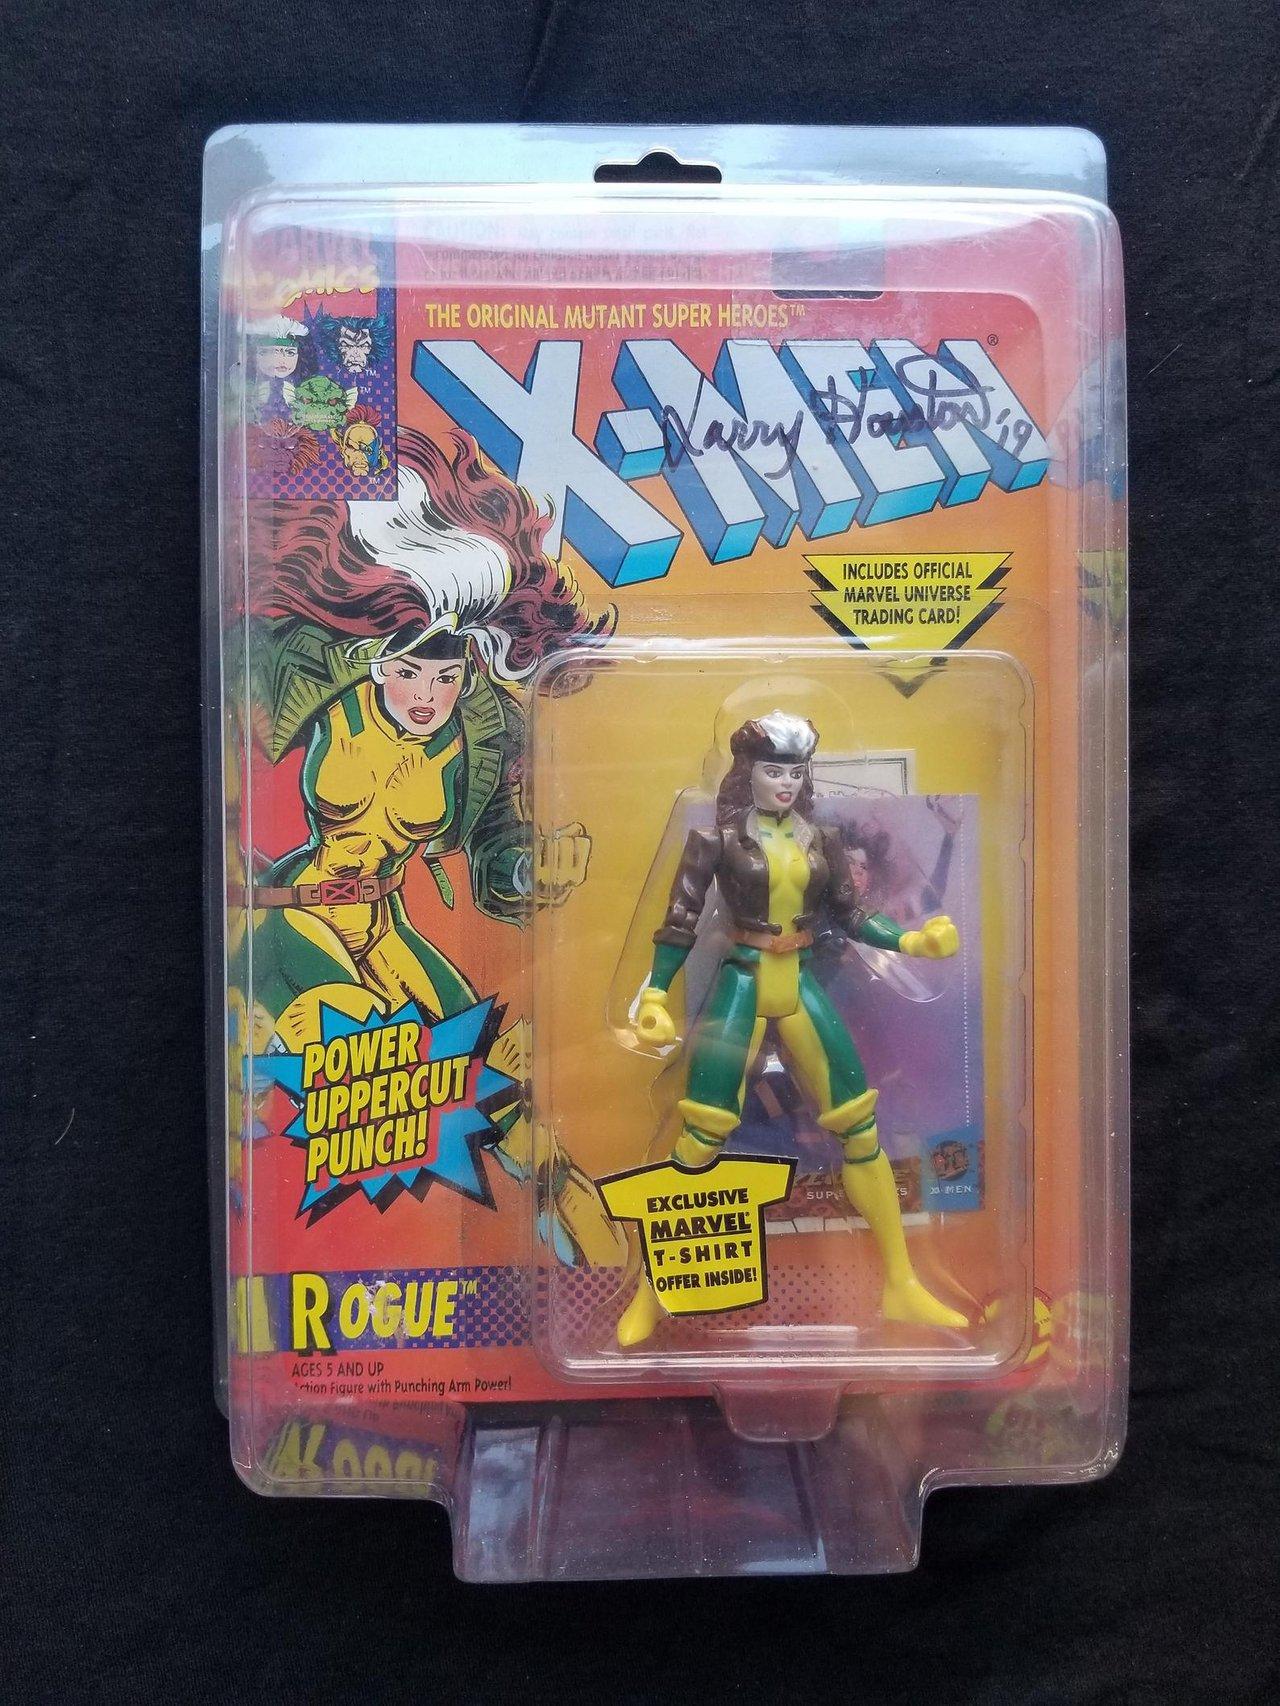 Autographed Toy Biz Rogue Marvel Uncanny X-Men Vintage Signed Action Figure Animated Series Retro Toys Collectibles 1990s Comic Books